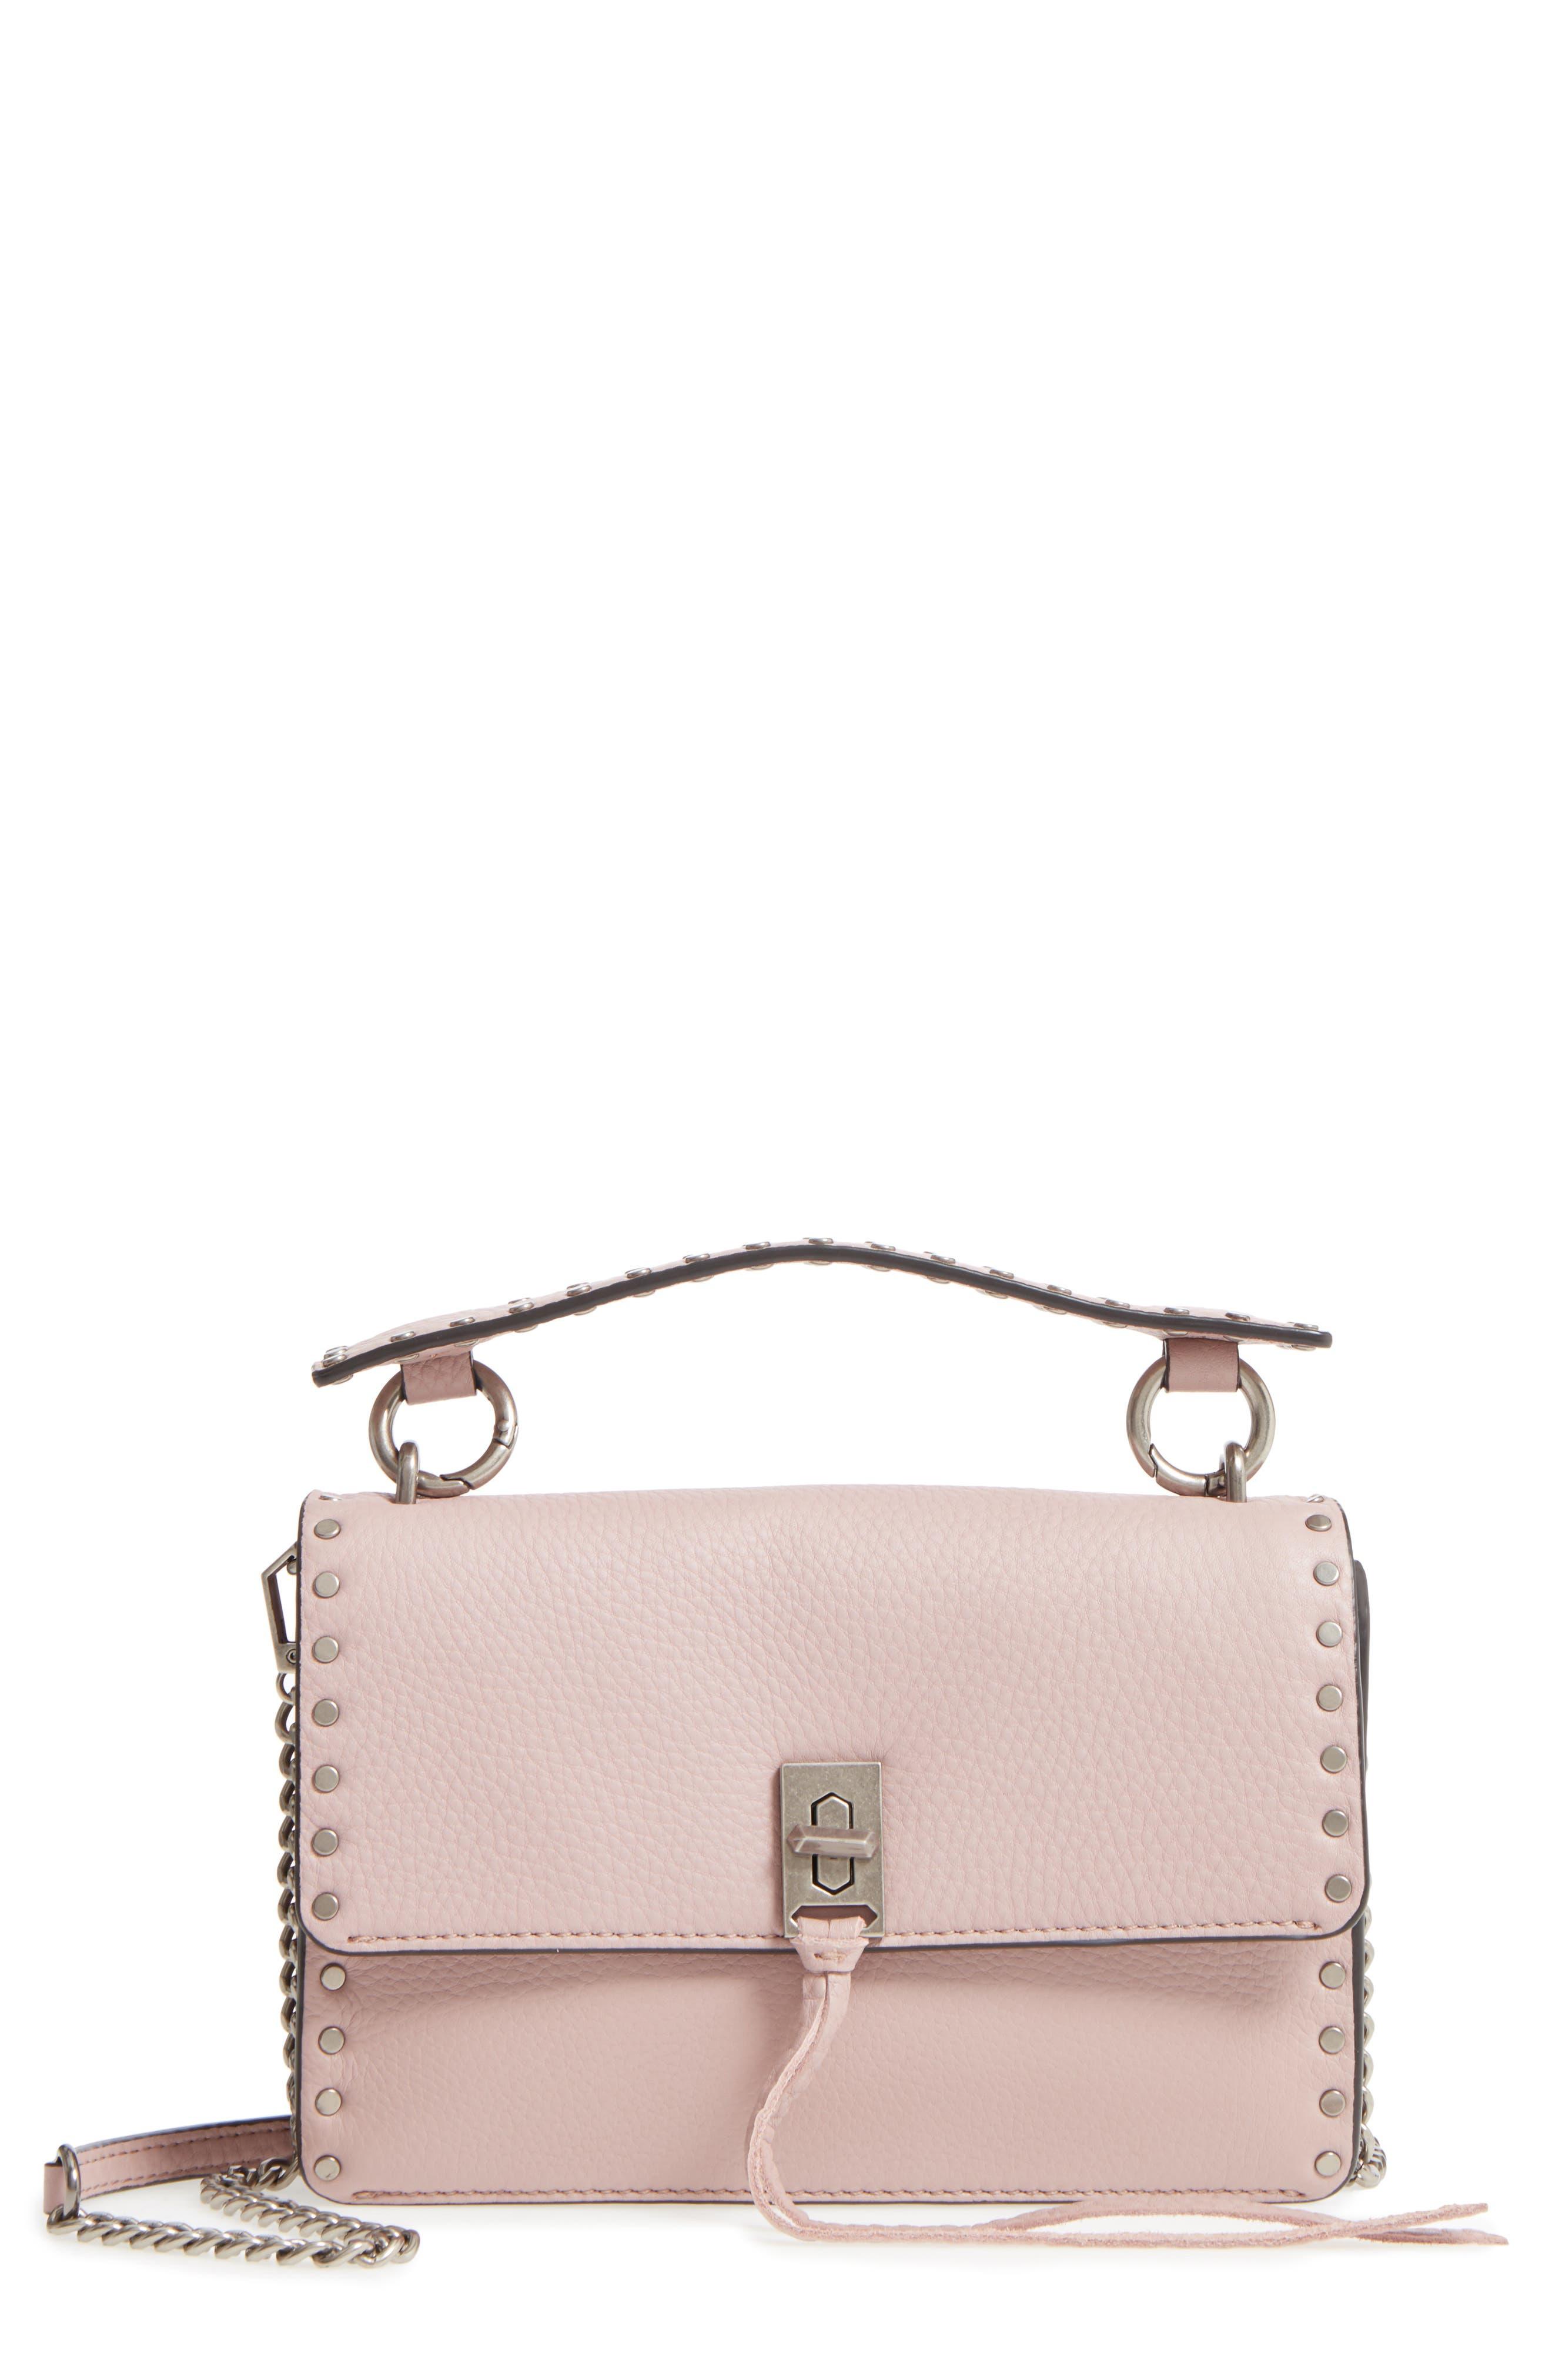 Darren Top Handle Crossbody Bag,                             Main thumbnail 1, color,                             Vintage Pink